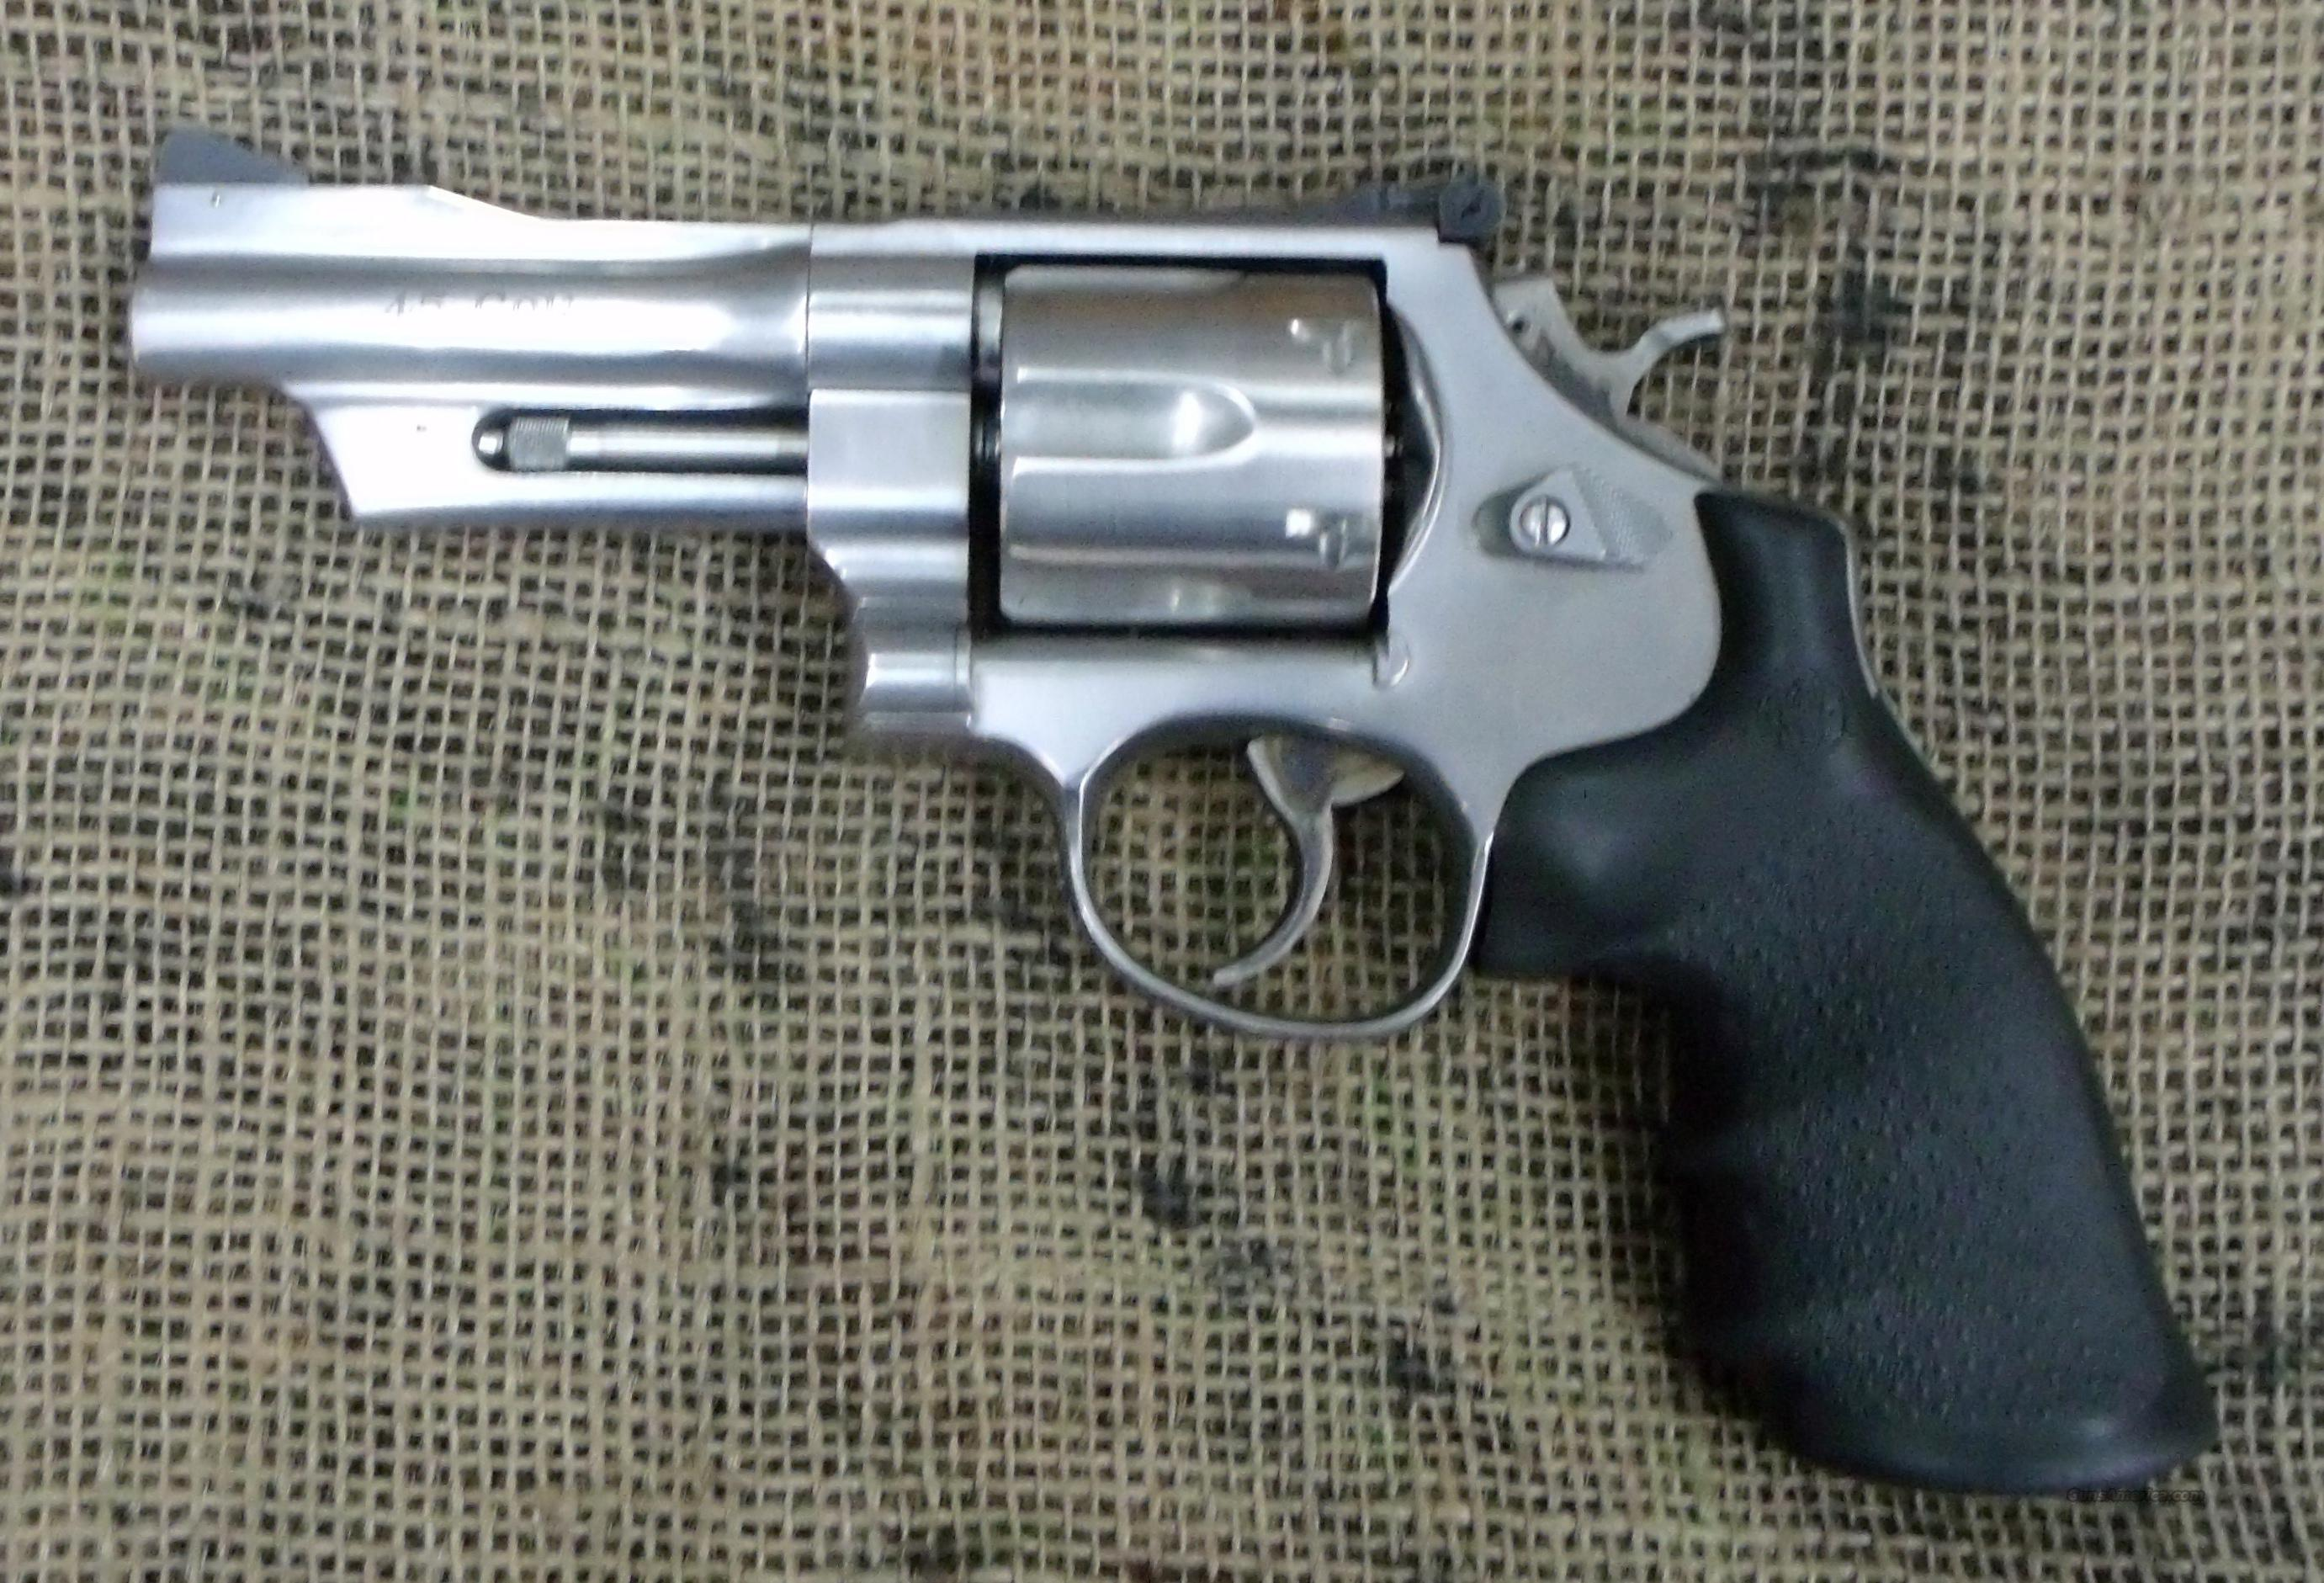 SMITH&WESSON Model 625-6 Mountain Gun, 45 Colt ... For Sale